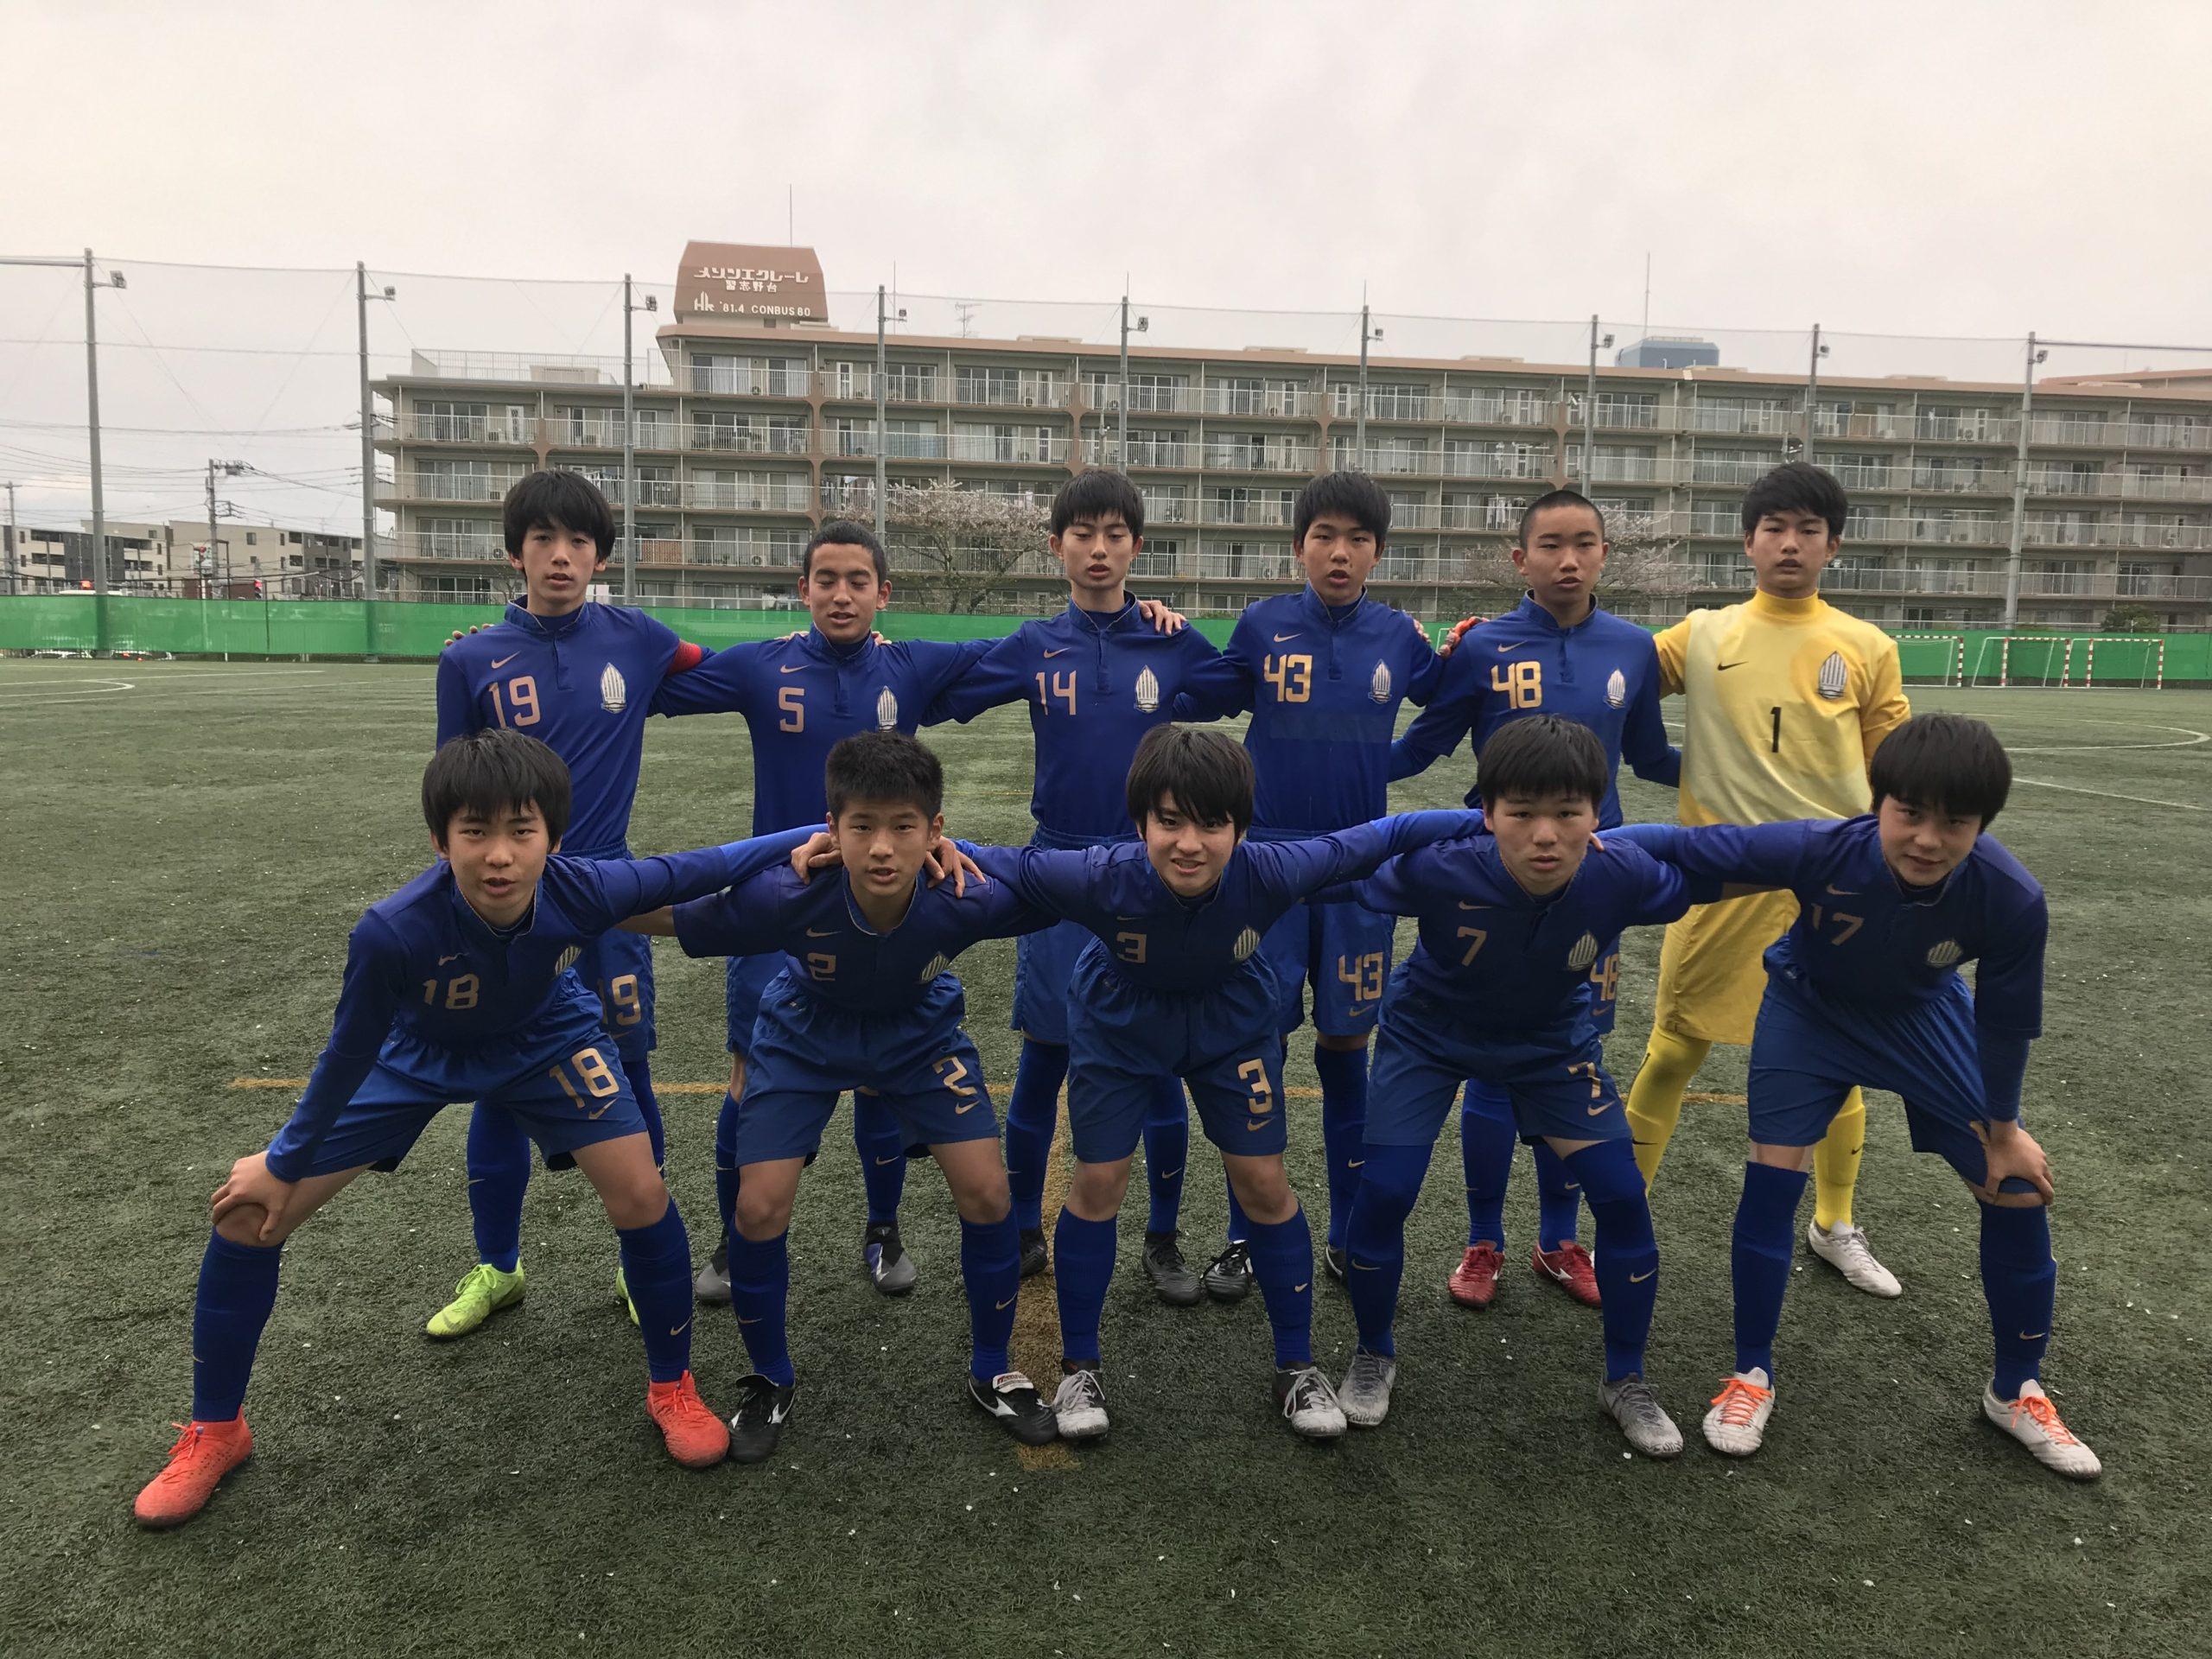 【U15】高円宮杯 U-15サッカー千葉県1部リーグ 第9節